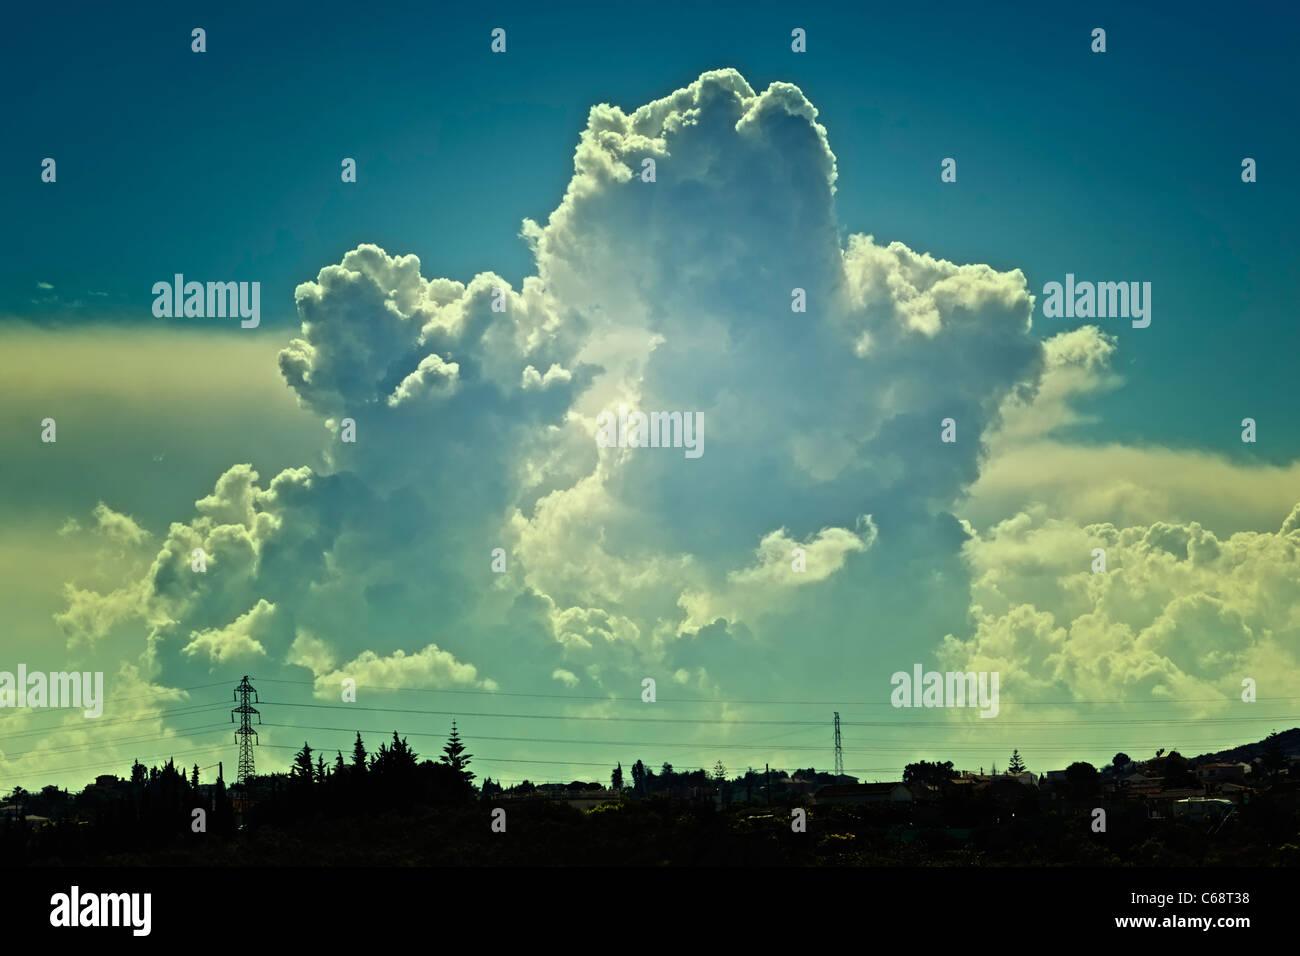 Storm clouds at dusk. Cumulus congestus. - Stock Image